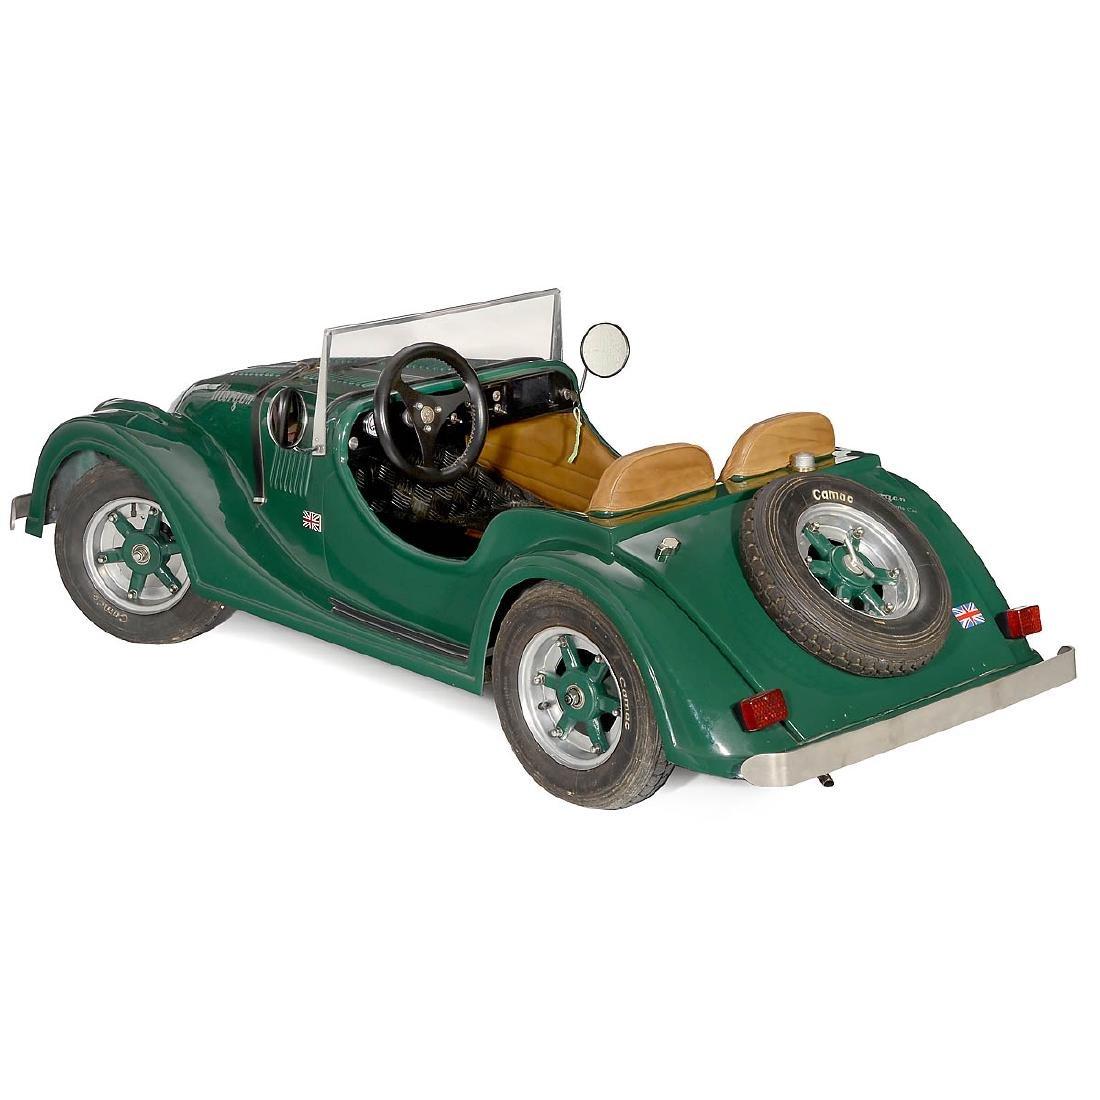 Morgan Plus 8 1:2 Scale Child's Car - 2